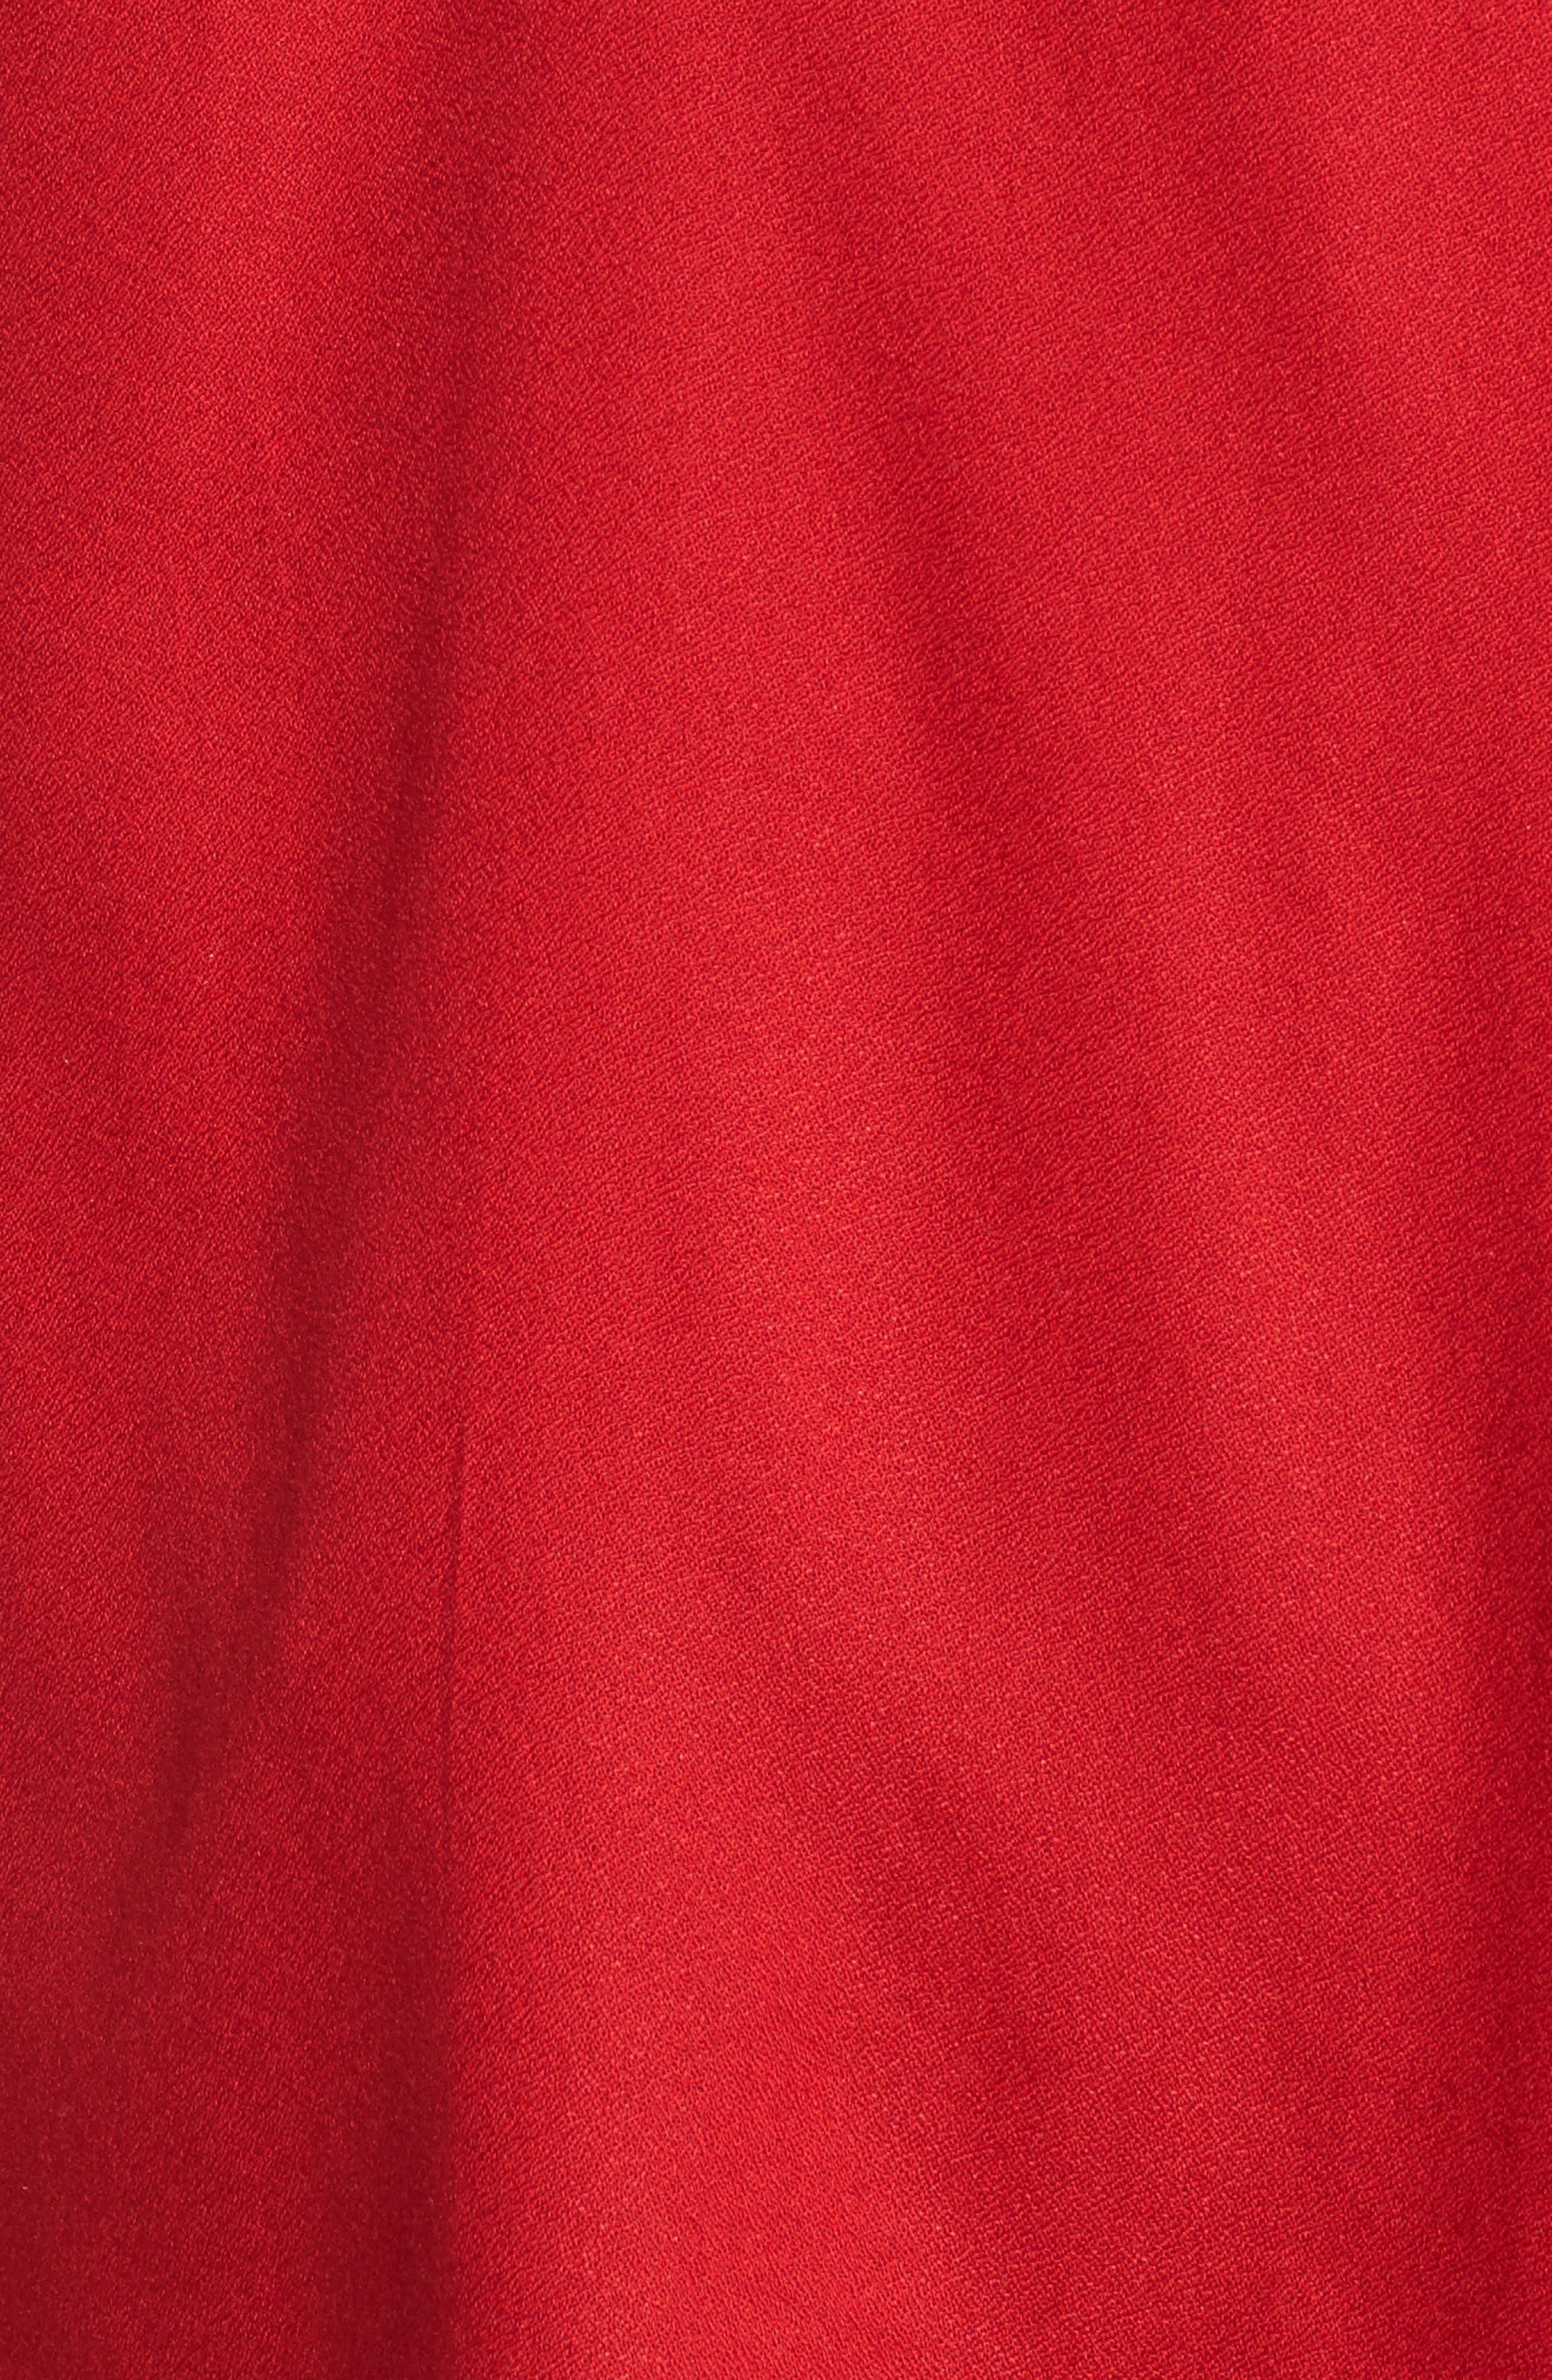 Blouson Sleeve Top,                             Alternate thumbnail 29, color,